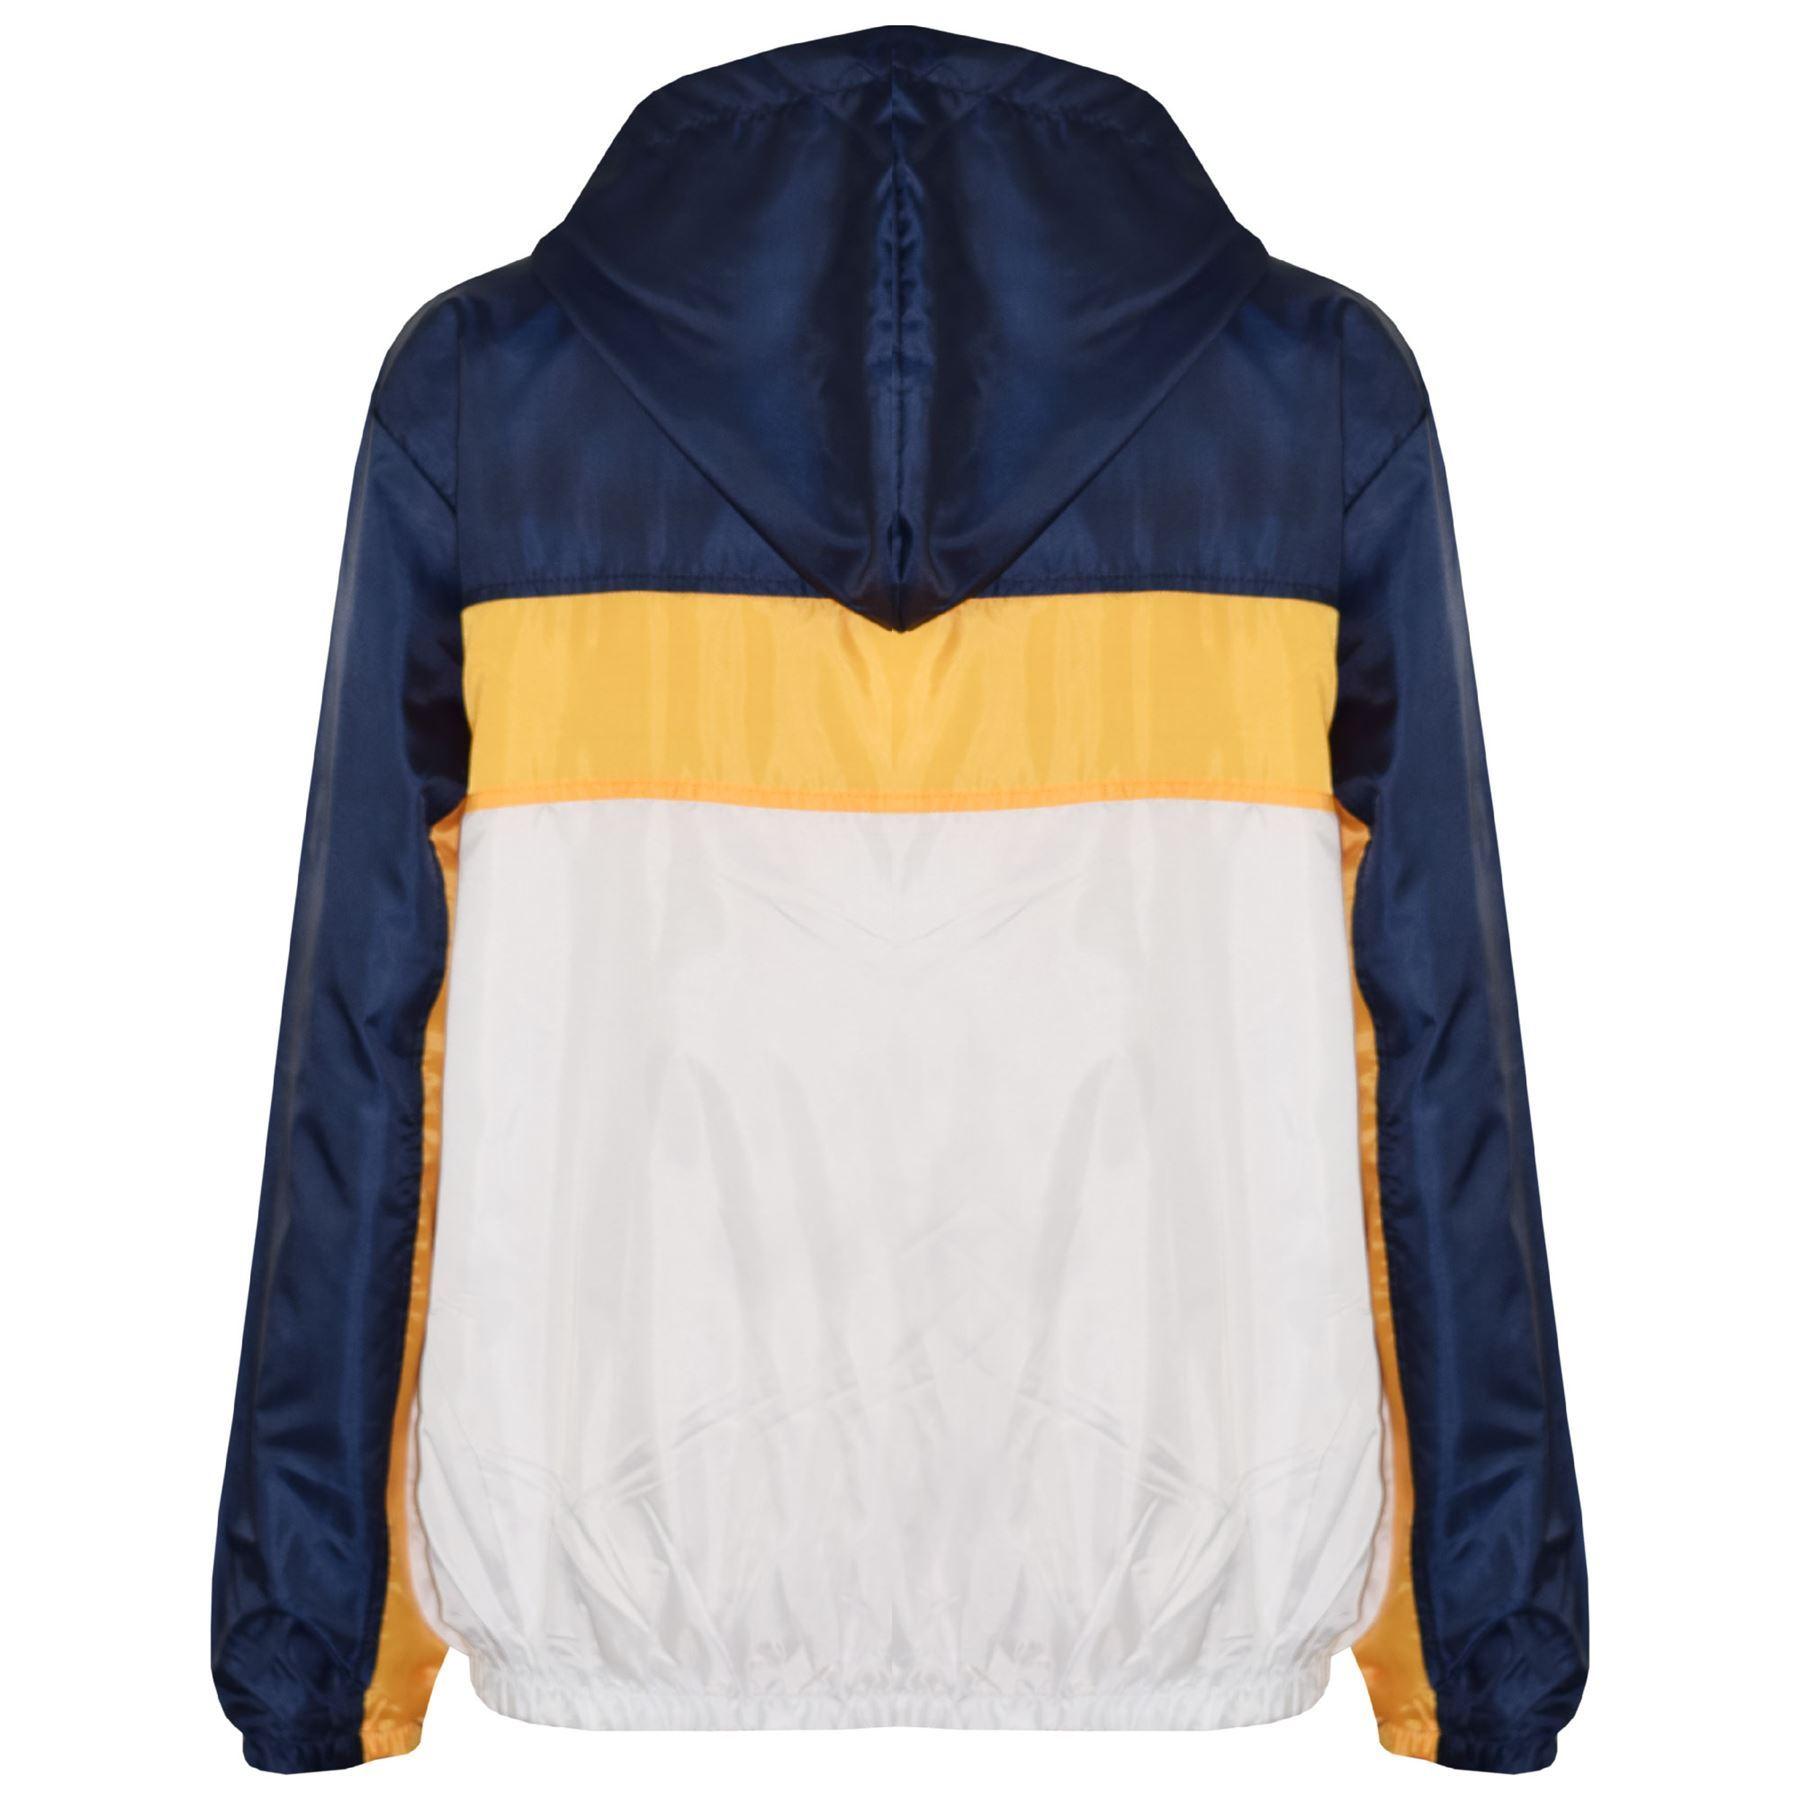 Kids-Boys-Girls-Windbreaker-Contrast-Block-Hooded-Jackets-Rain-Mac-Raincoat-5-13 thumbnail 9